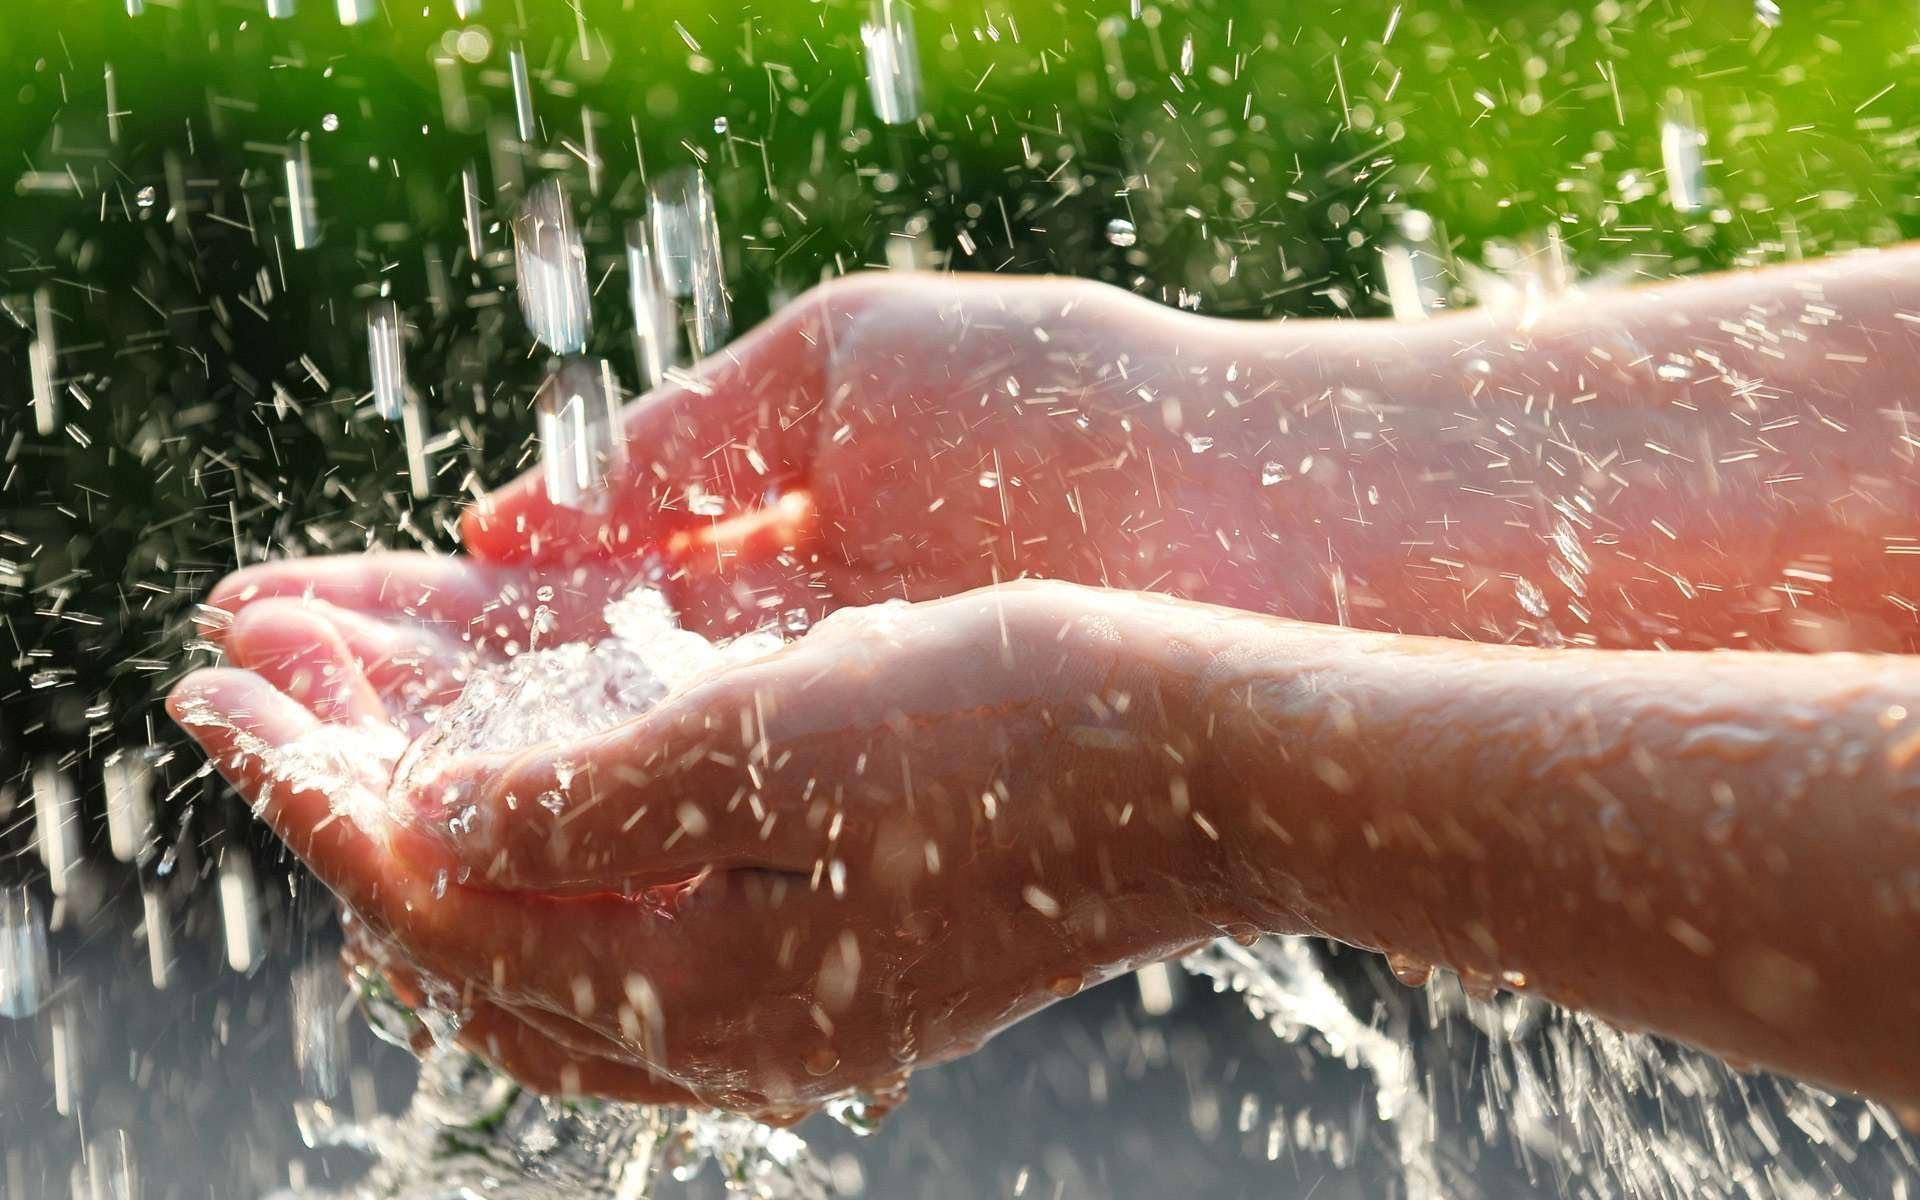 как навести чистоту тела и души